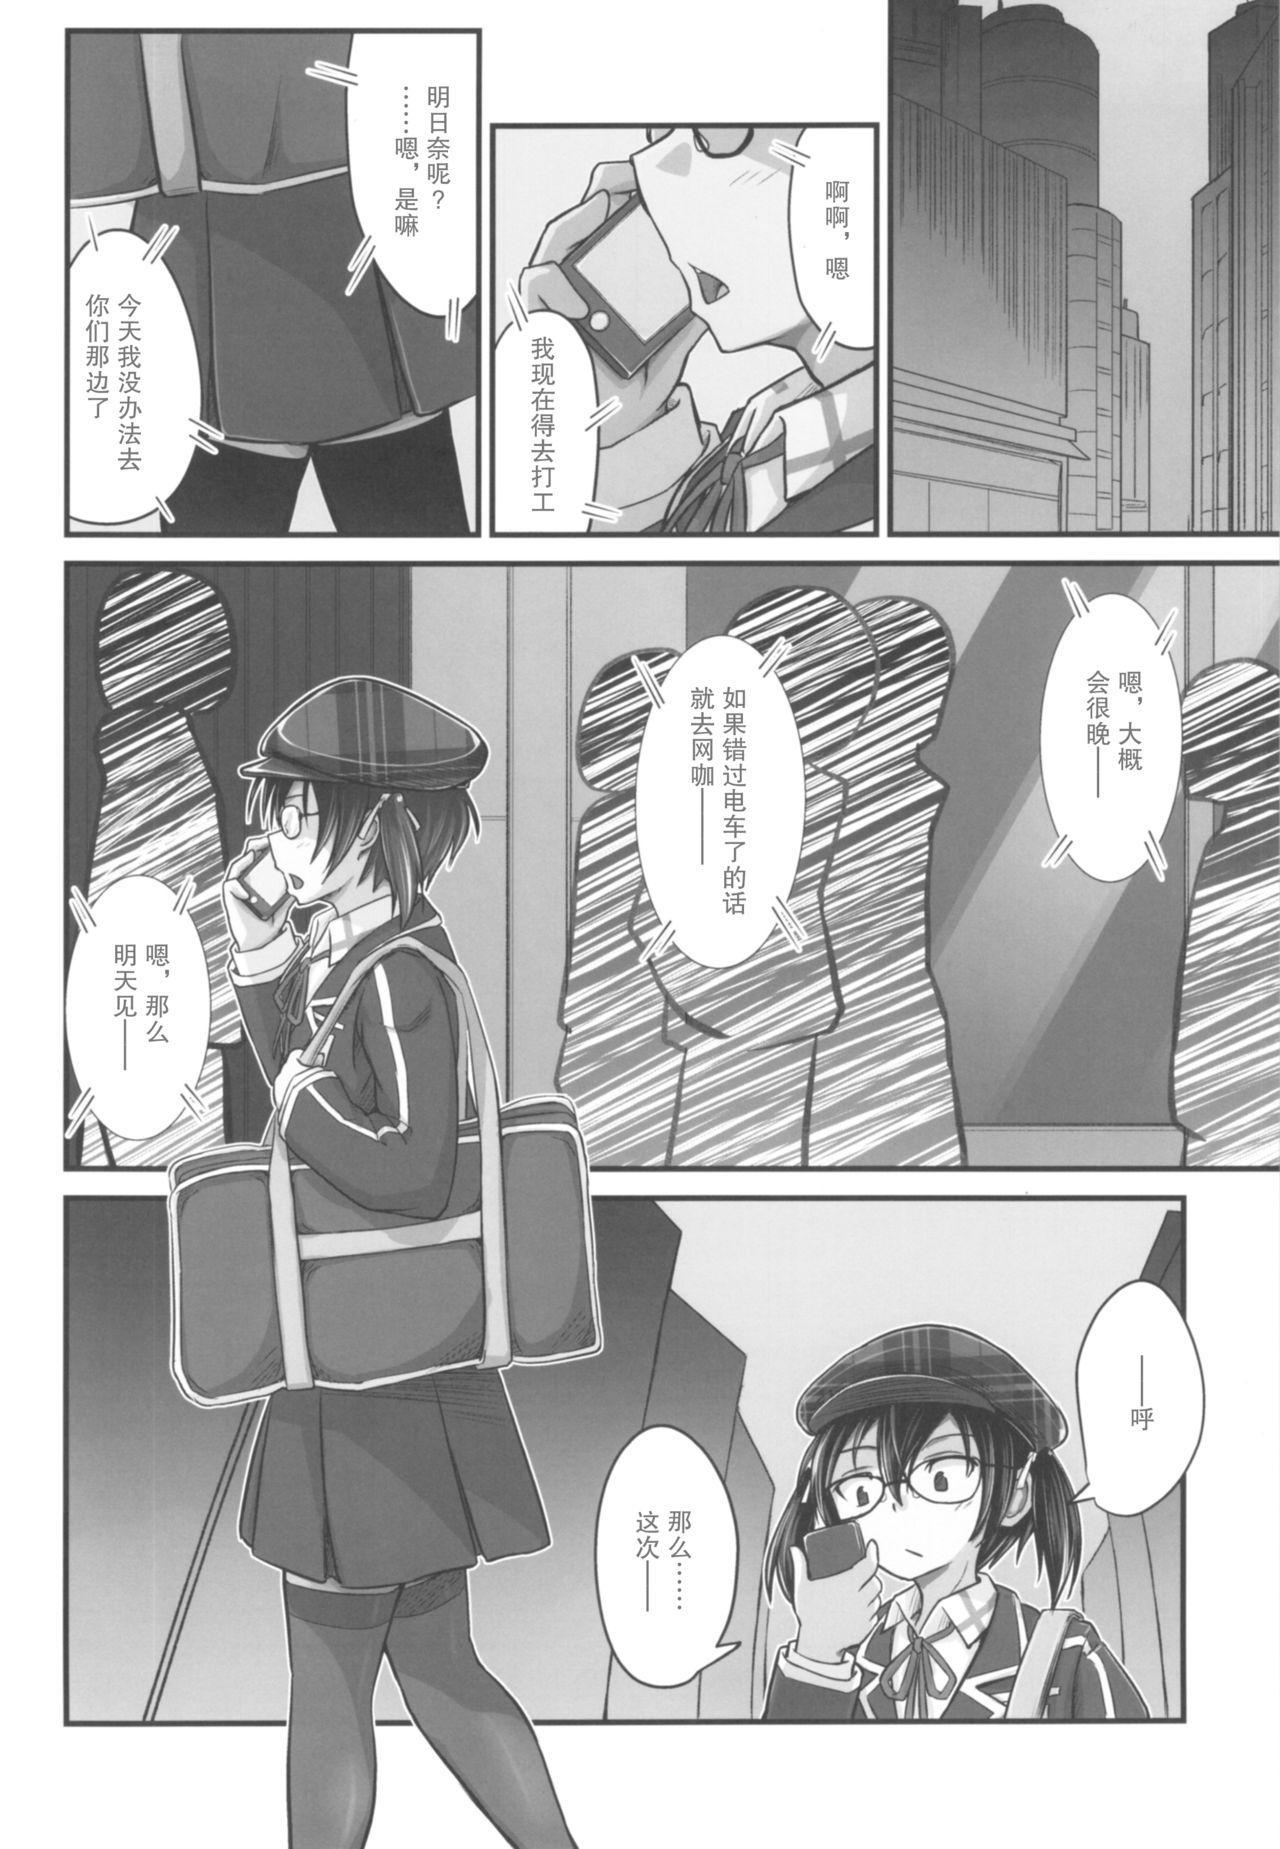 [Umari-ya (D-2)] Kiriko Route Another #05 ~Seifuku Josou Anal Junchi Hen~ (Sword Art Online) ) [Chinese] [不可视汉化] 3